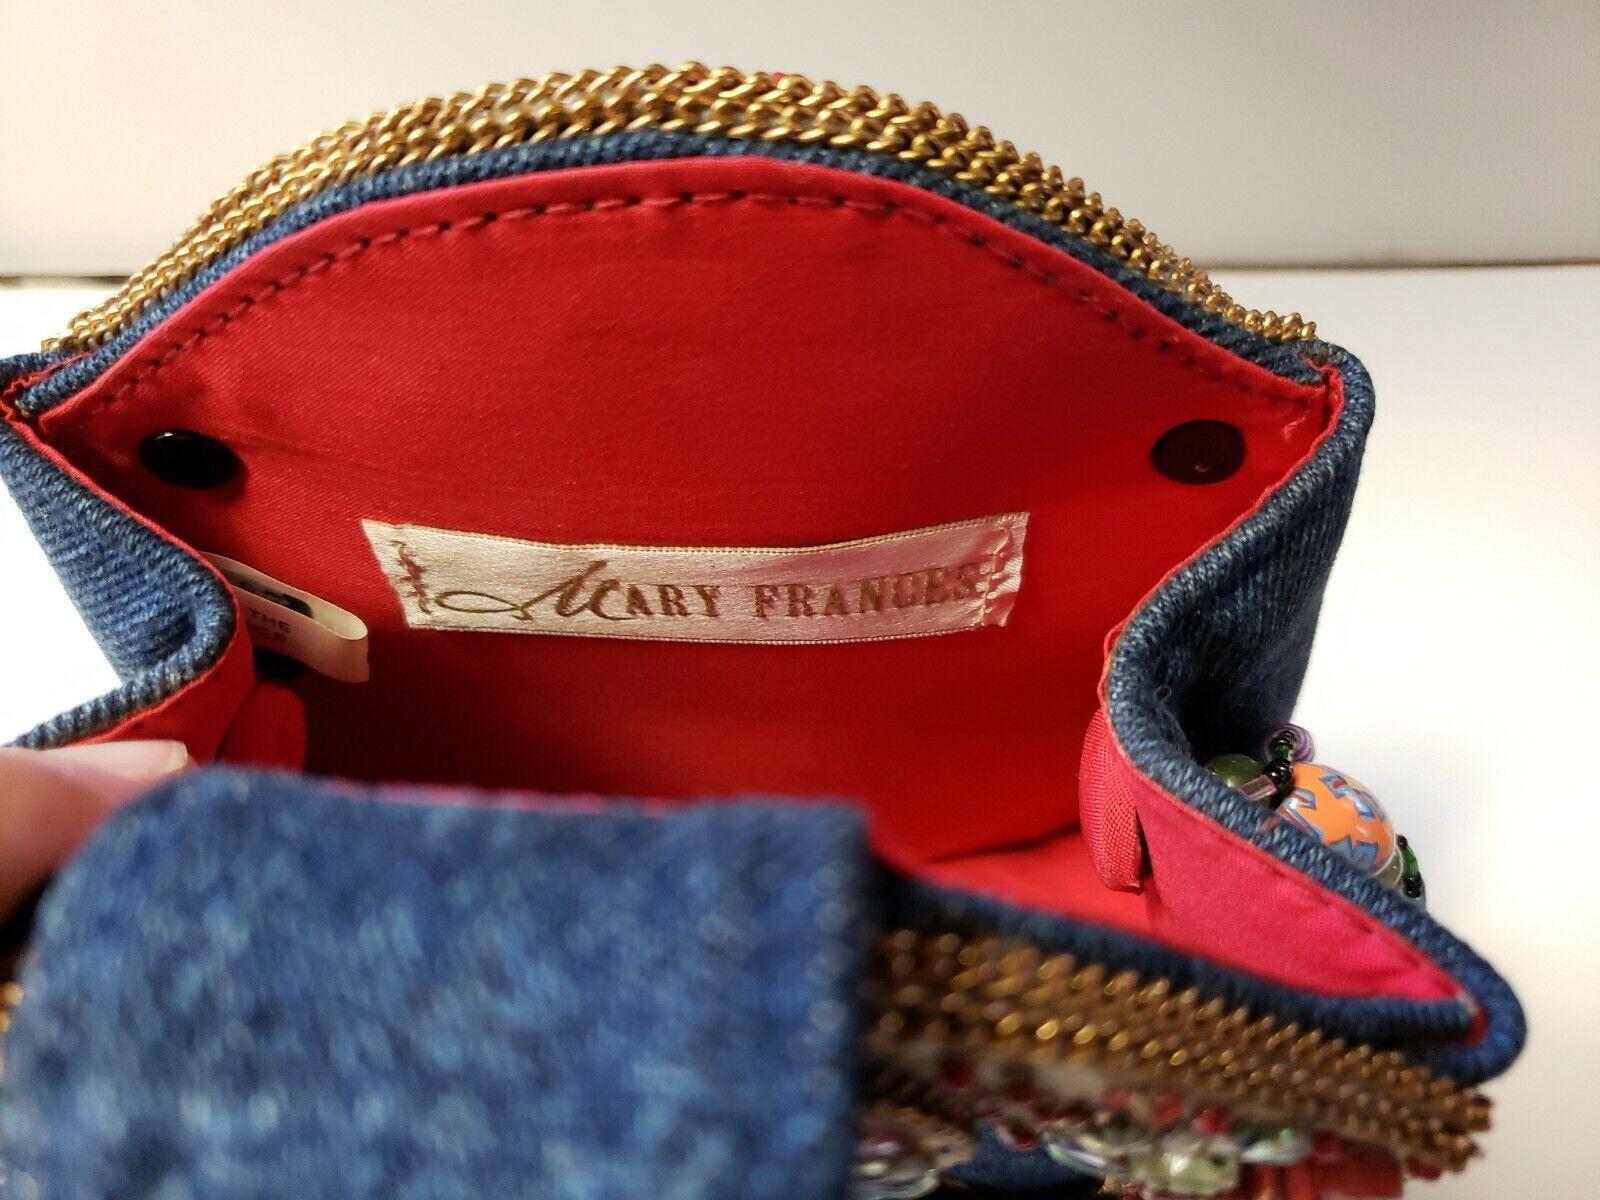 Mary Frances Butterfly Purse Handbag - image 3